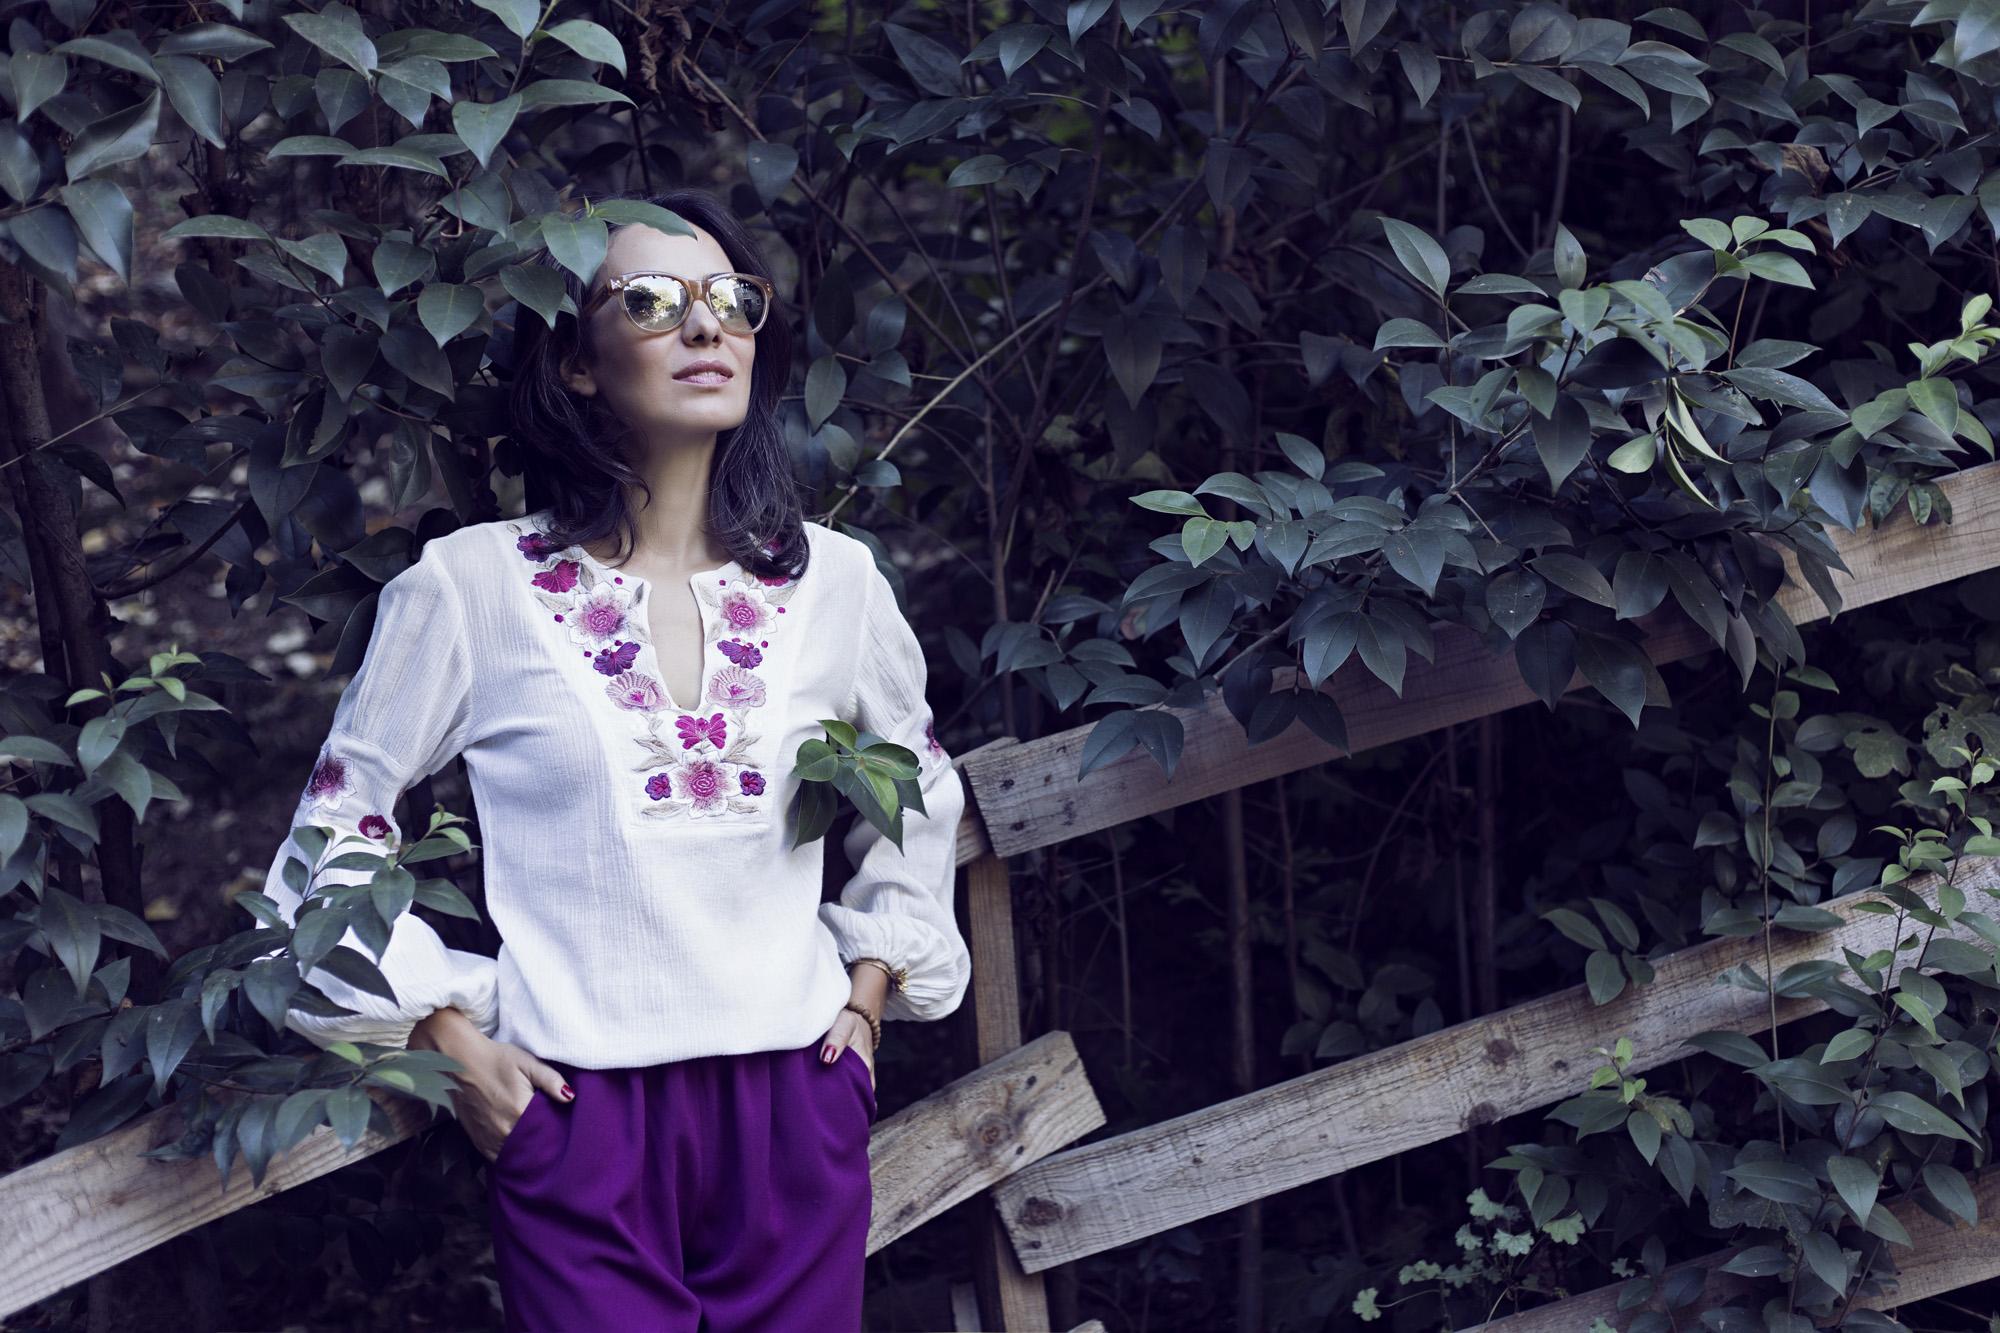 morgan de toi, ebru karabayır, şalvar pantolon modelleri, nakışlı bluz modelleri, hippi stili, hally&son, styleboom for morhipo